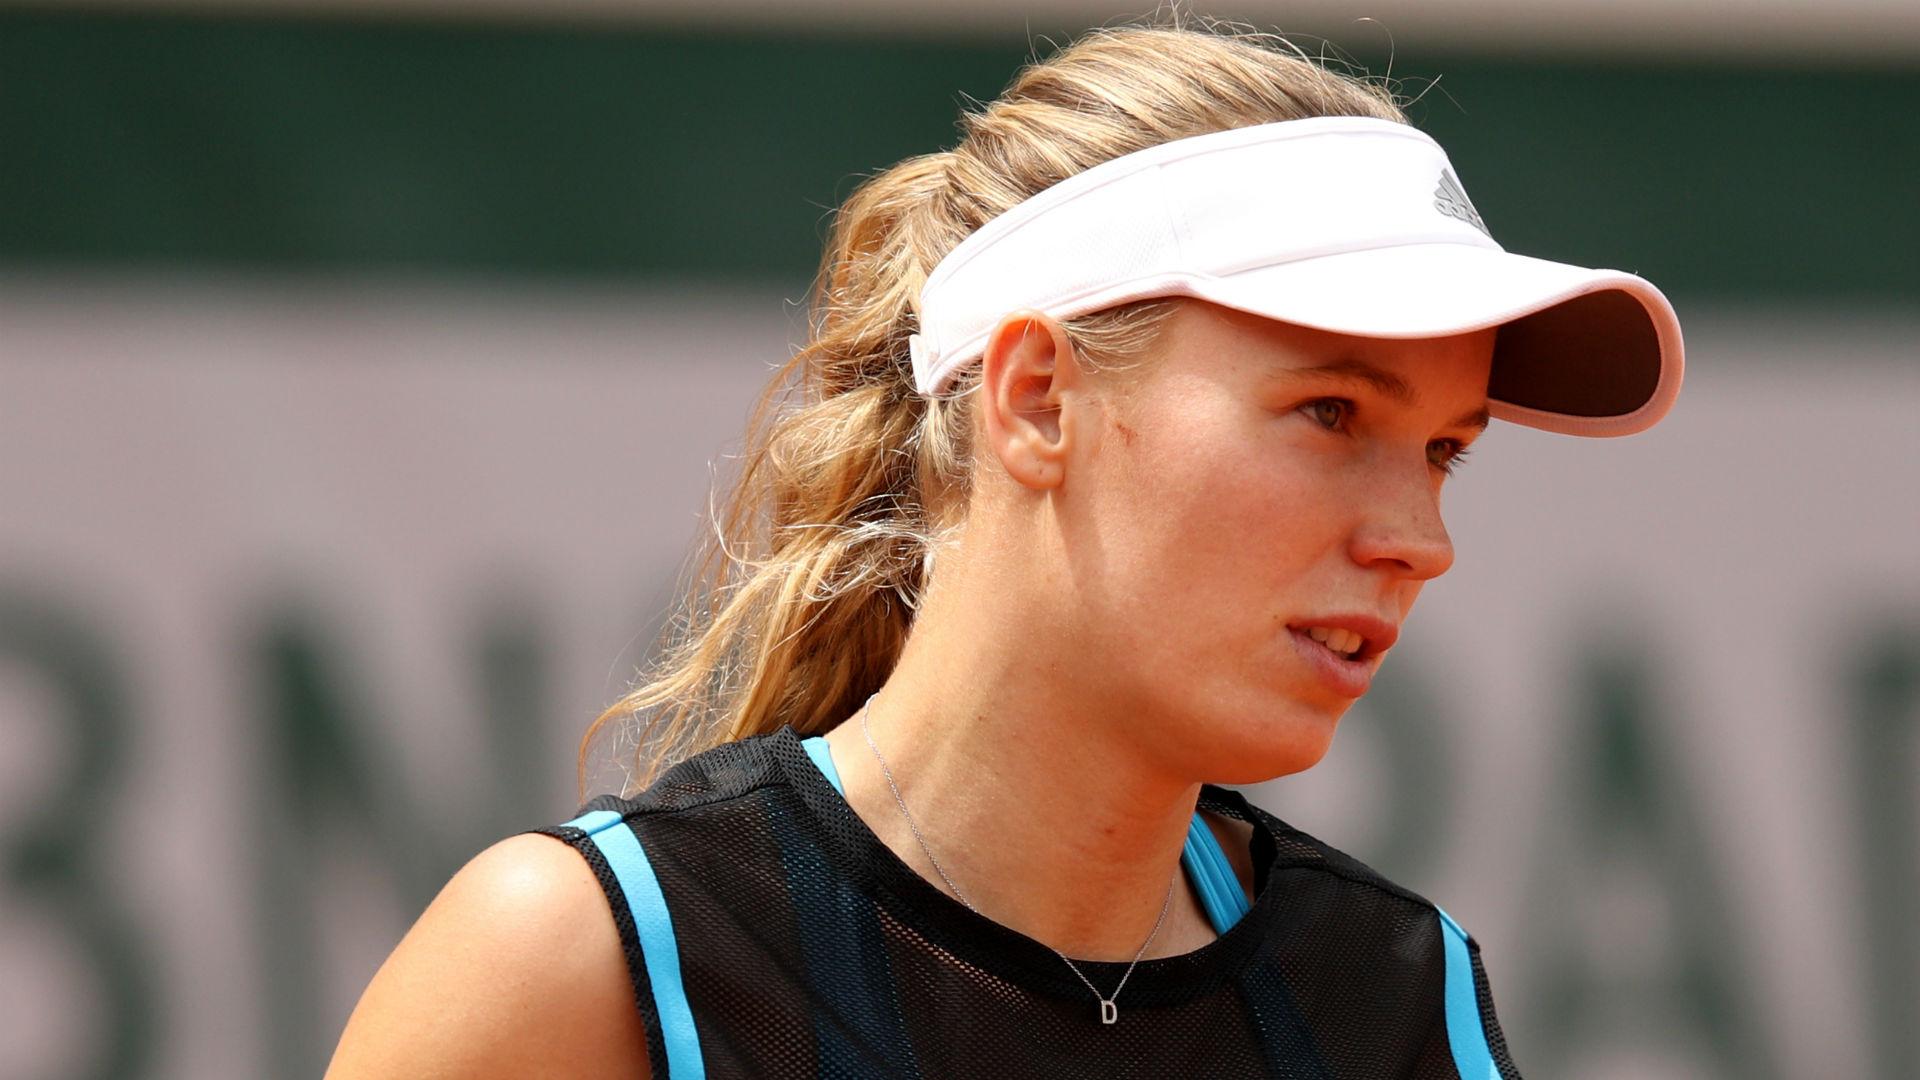 Defending champion Caroline Wozniacki and 2018 Wimbledon winner Angelique Kerber both progressed at Eastbourne on Tuesday.